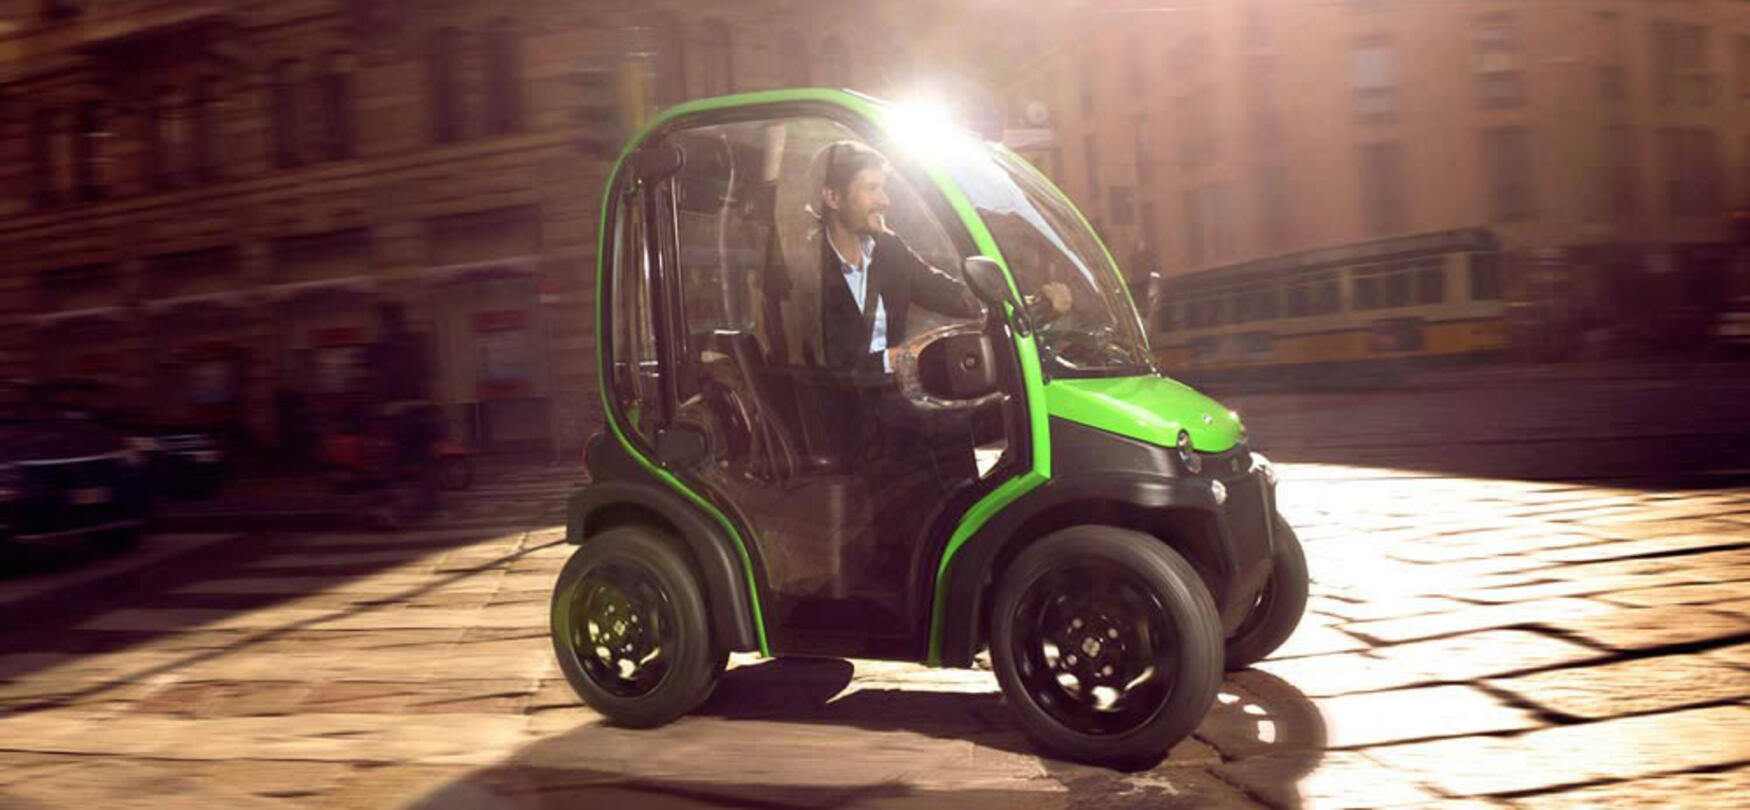 ambienthotels en electric-vehicle-rental-rimini 006